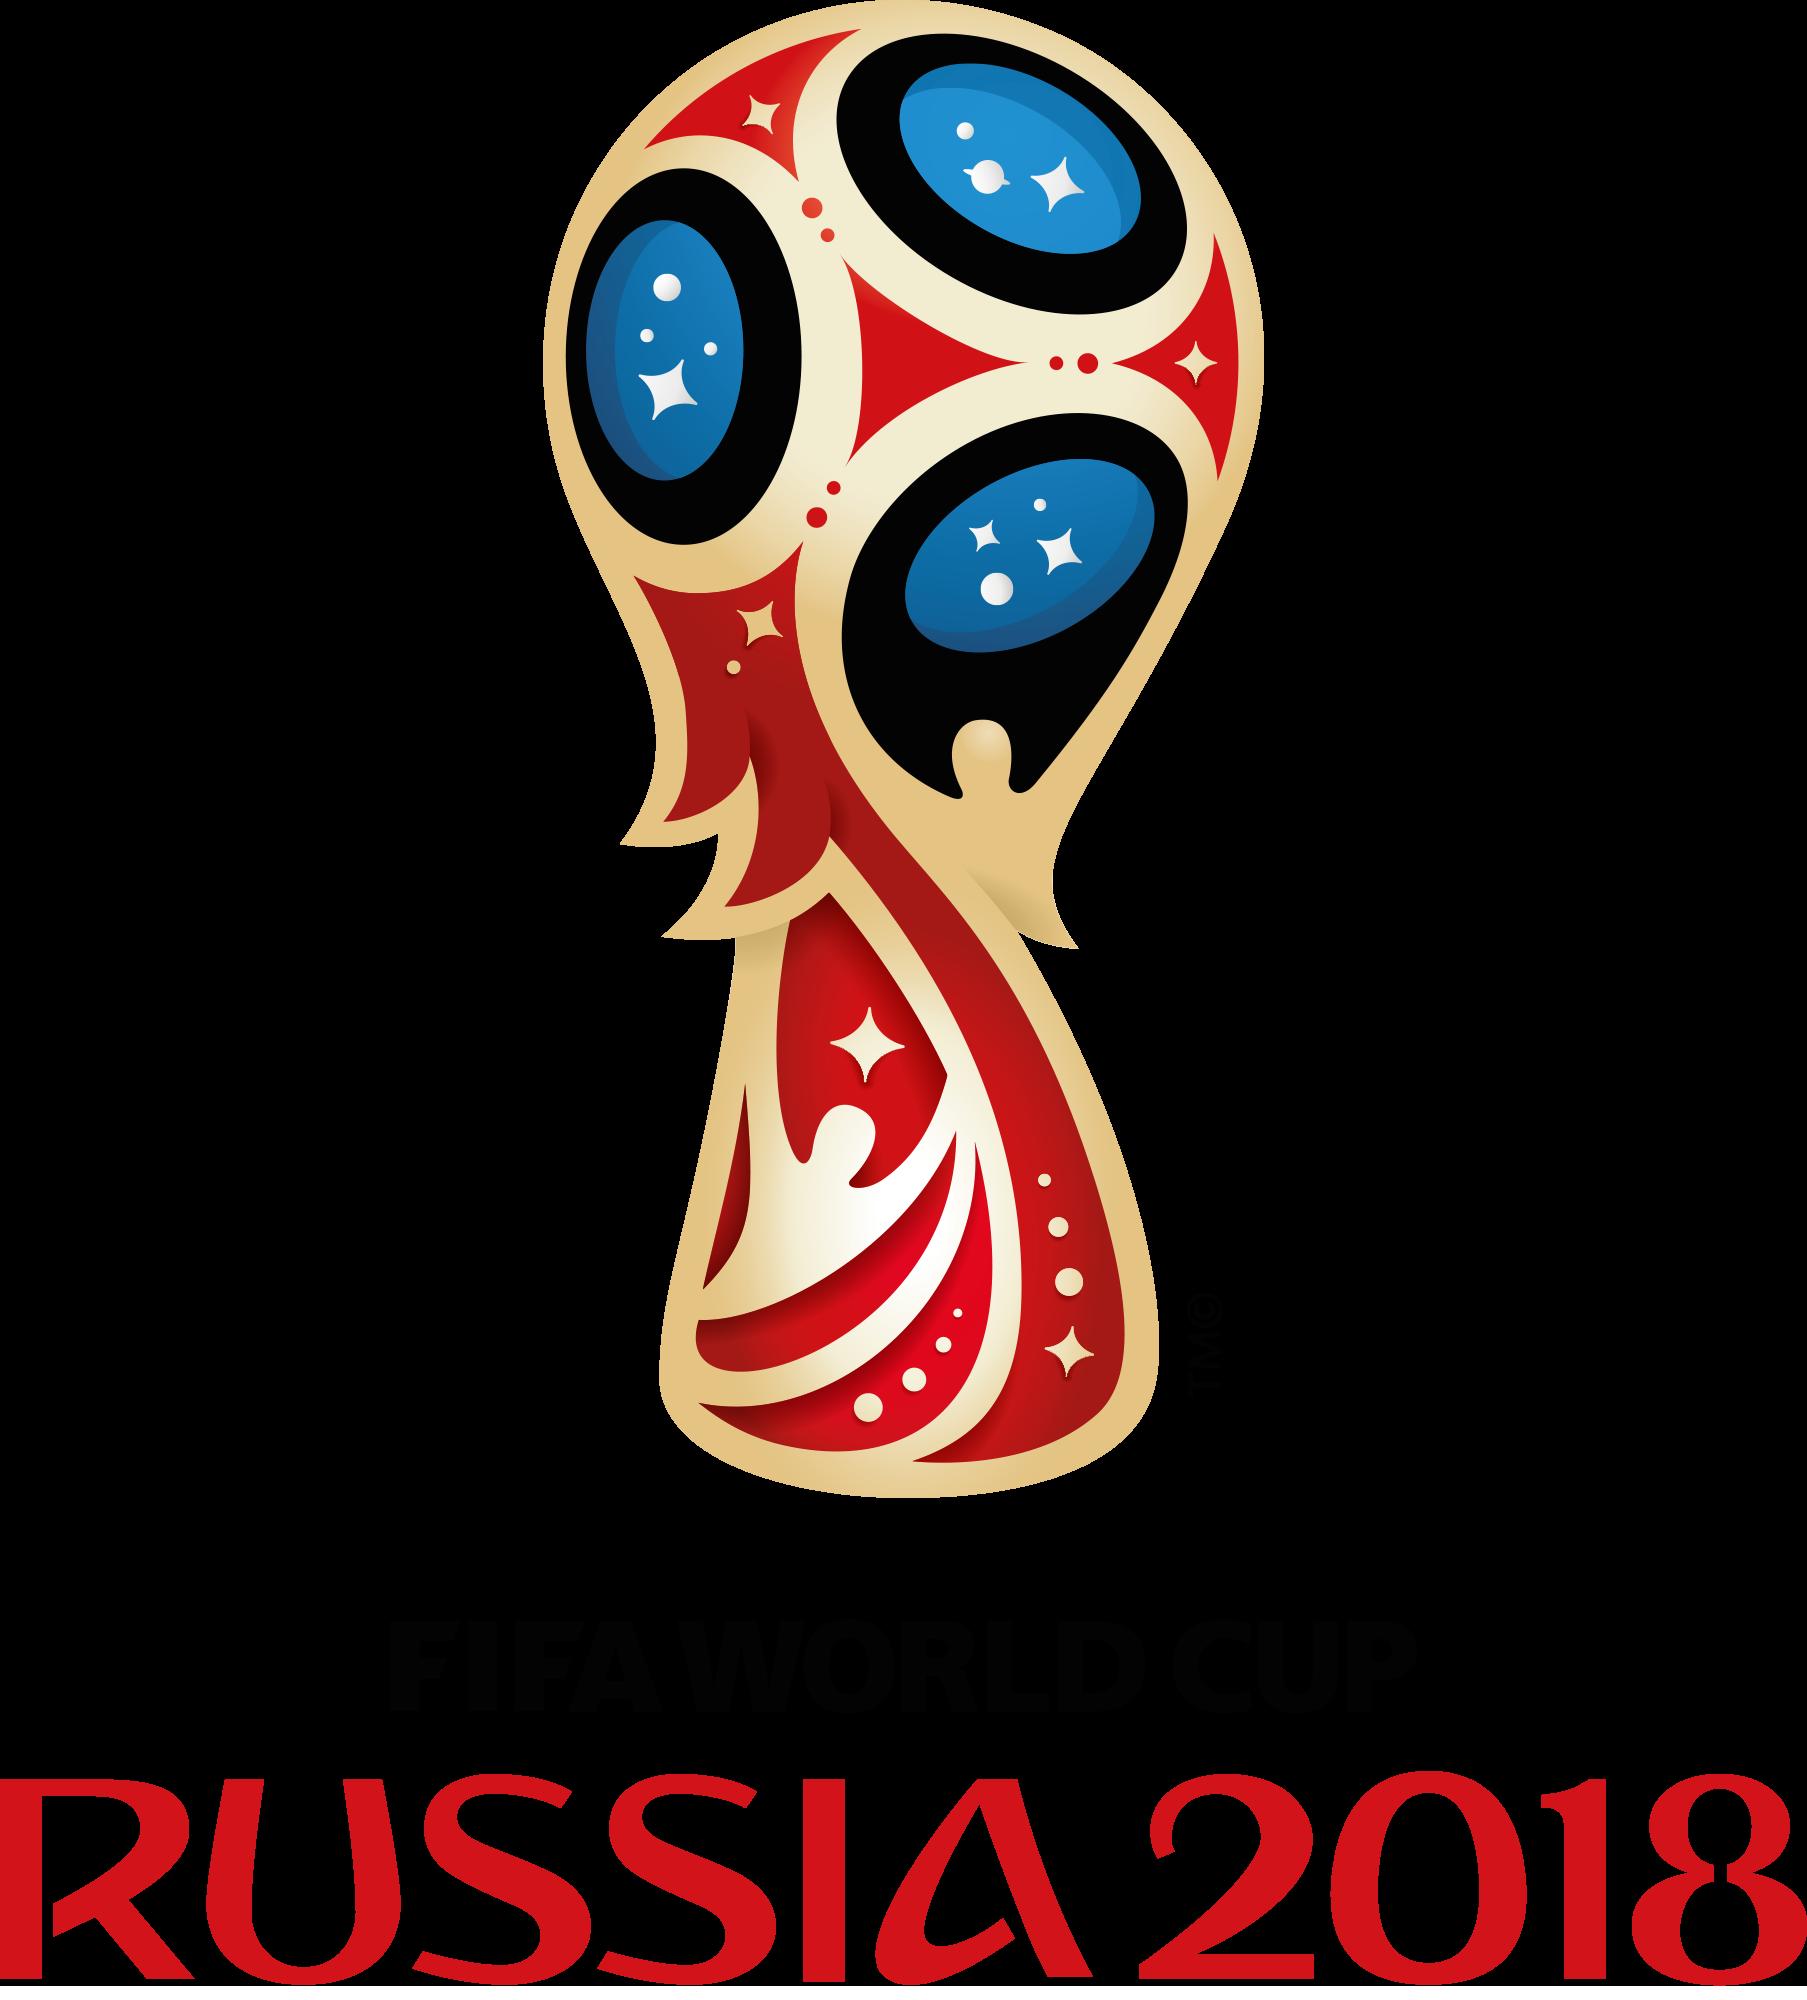 Эмблема (логотип) Чемпионата мира по футболу 2018 в векторном формате (FIFA World Cup 2018 Logo)